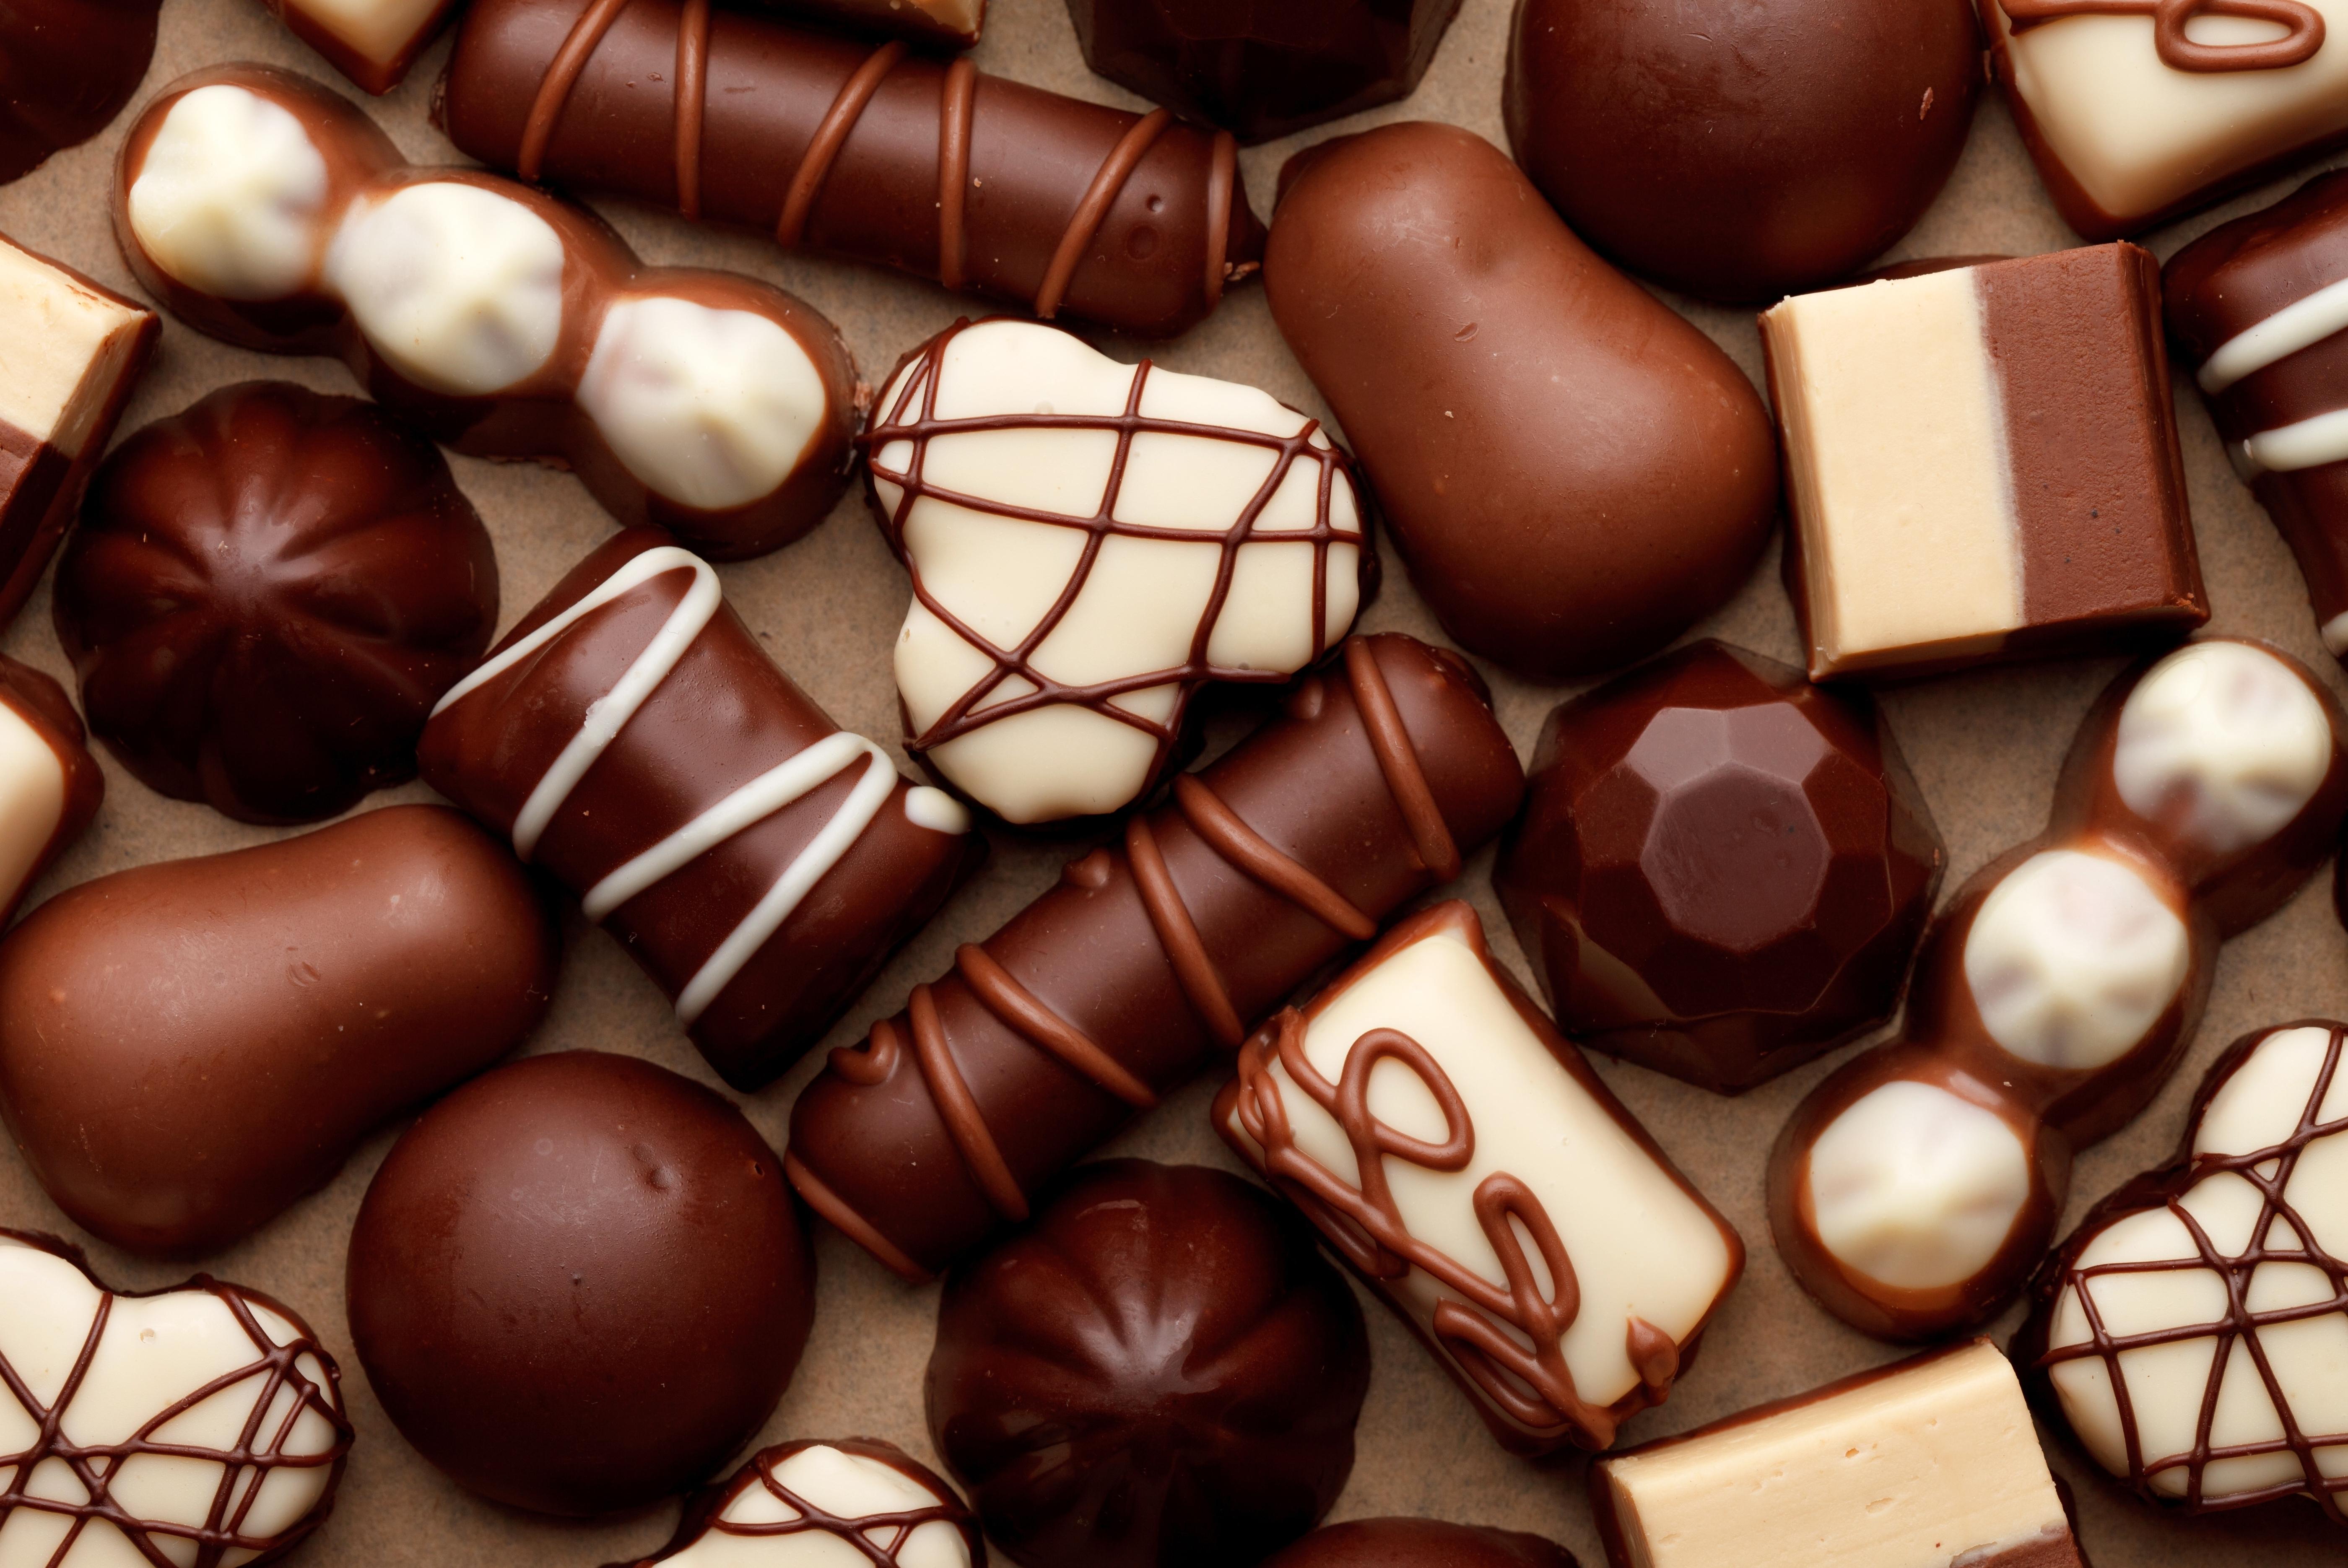 Chocolate Computer Wallpapers Desktop Backgrounds 5600x3740 ID 5600x3740